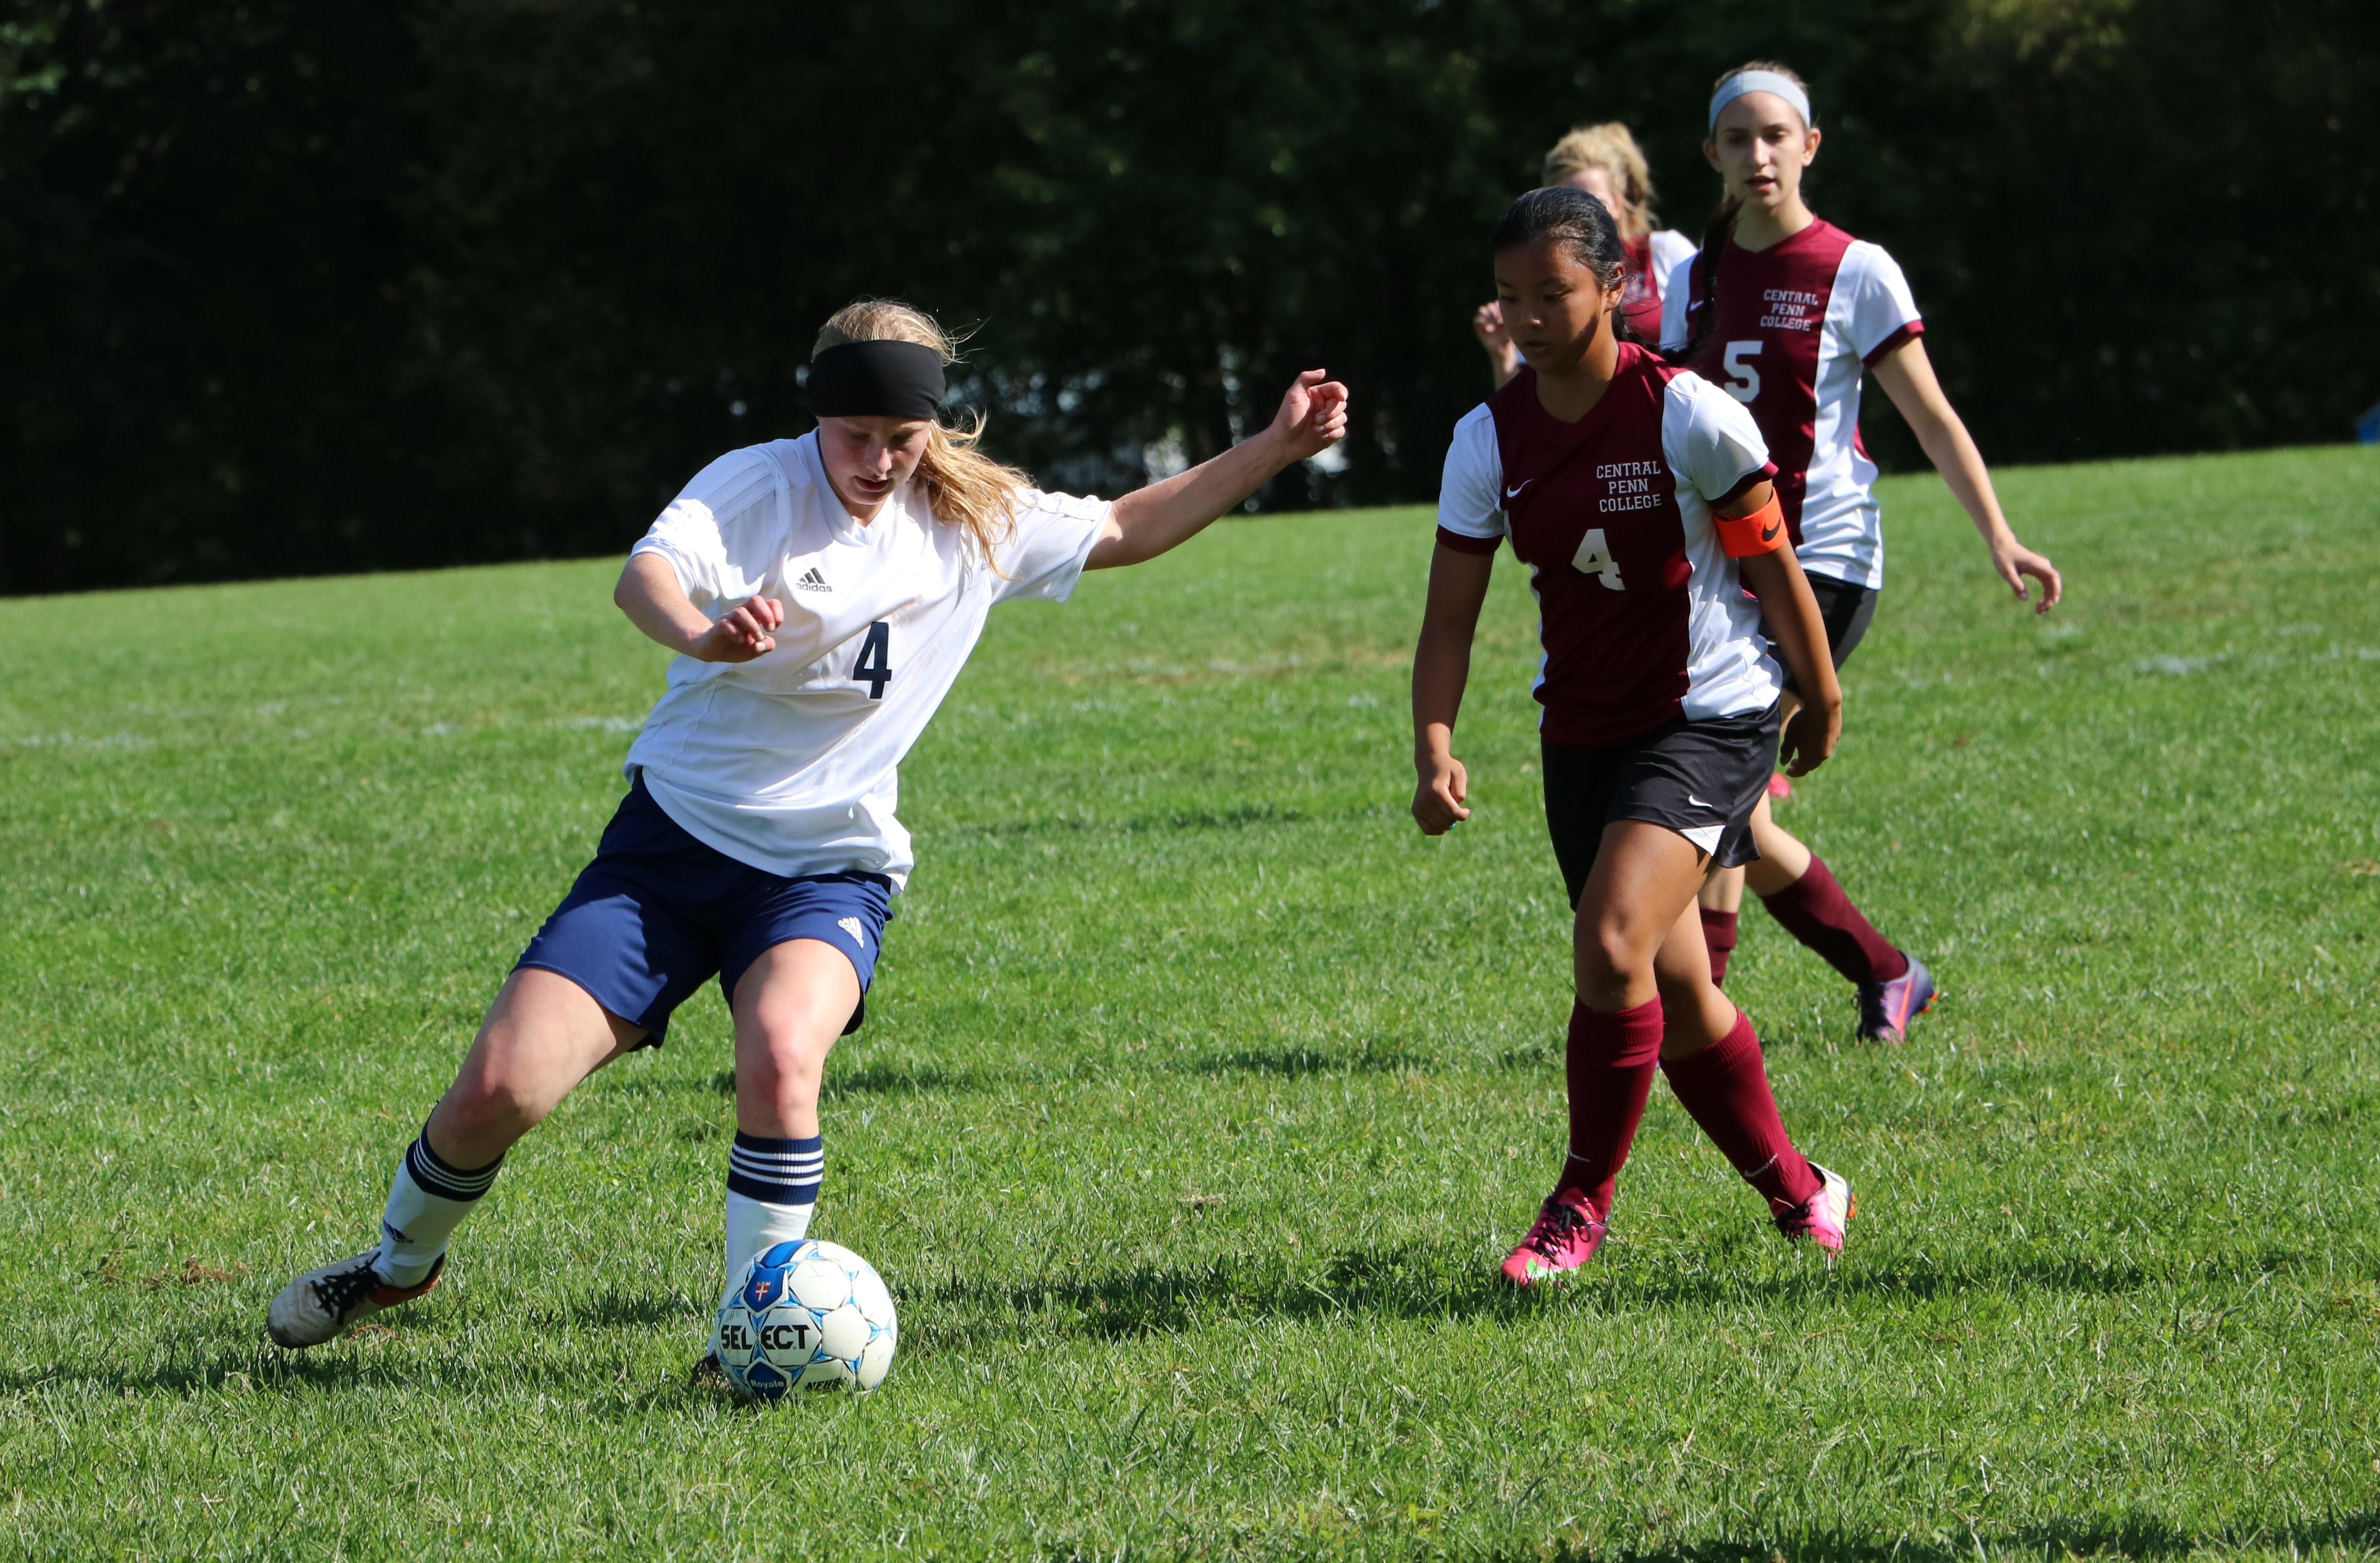 Patrick Henry College Women's Soccer